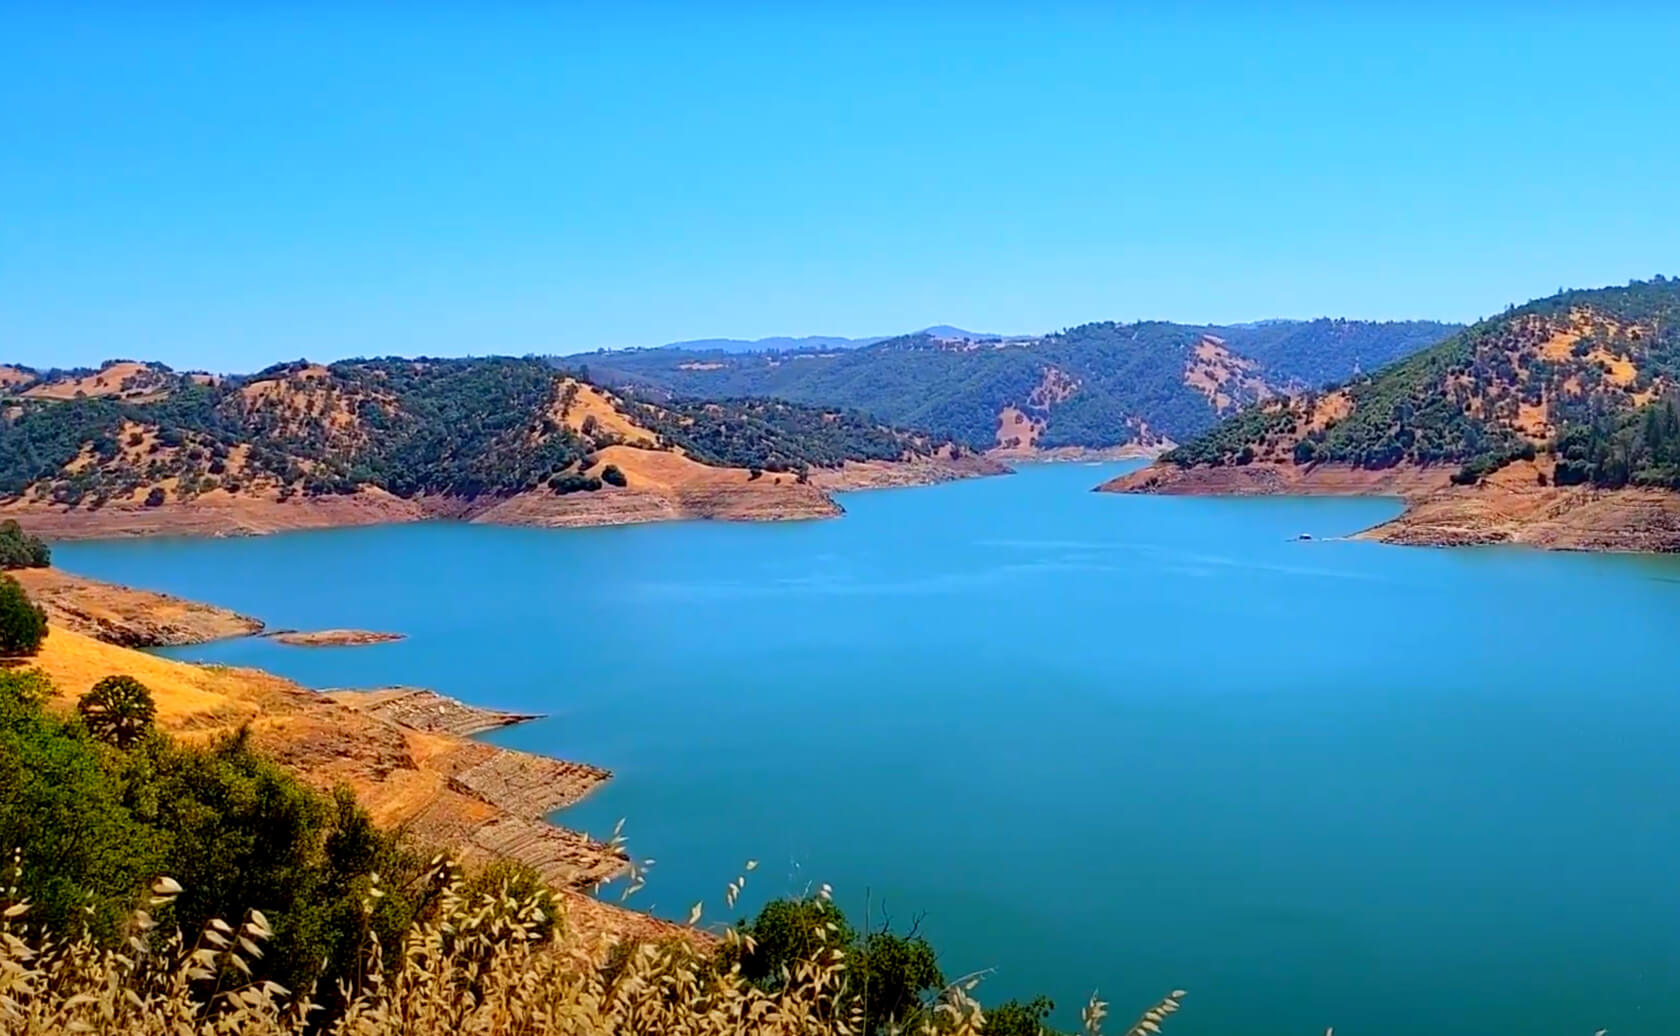 New-Melones-Lake-Fishing-Guide-Report-California-11